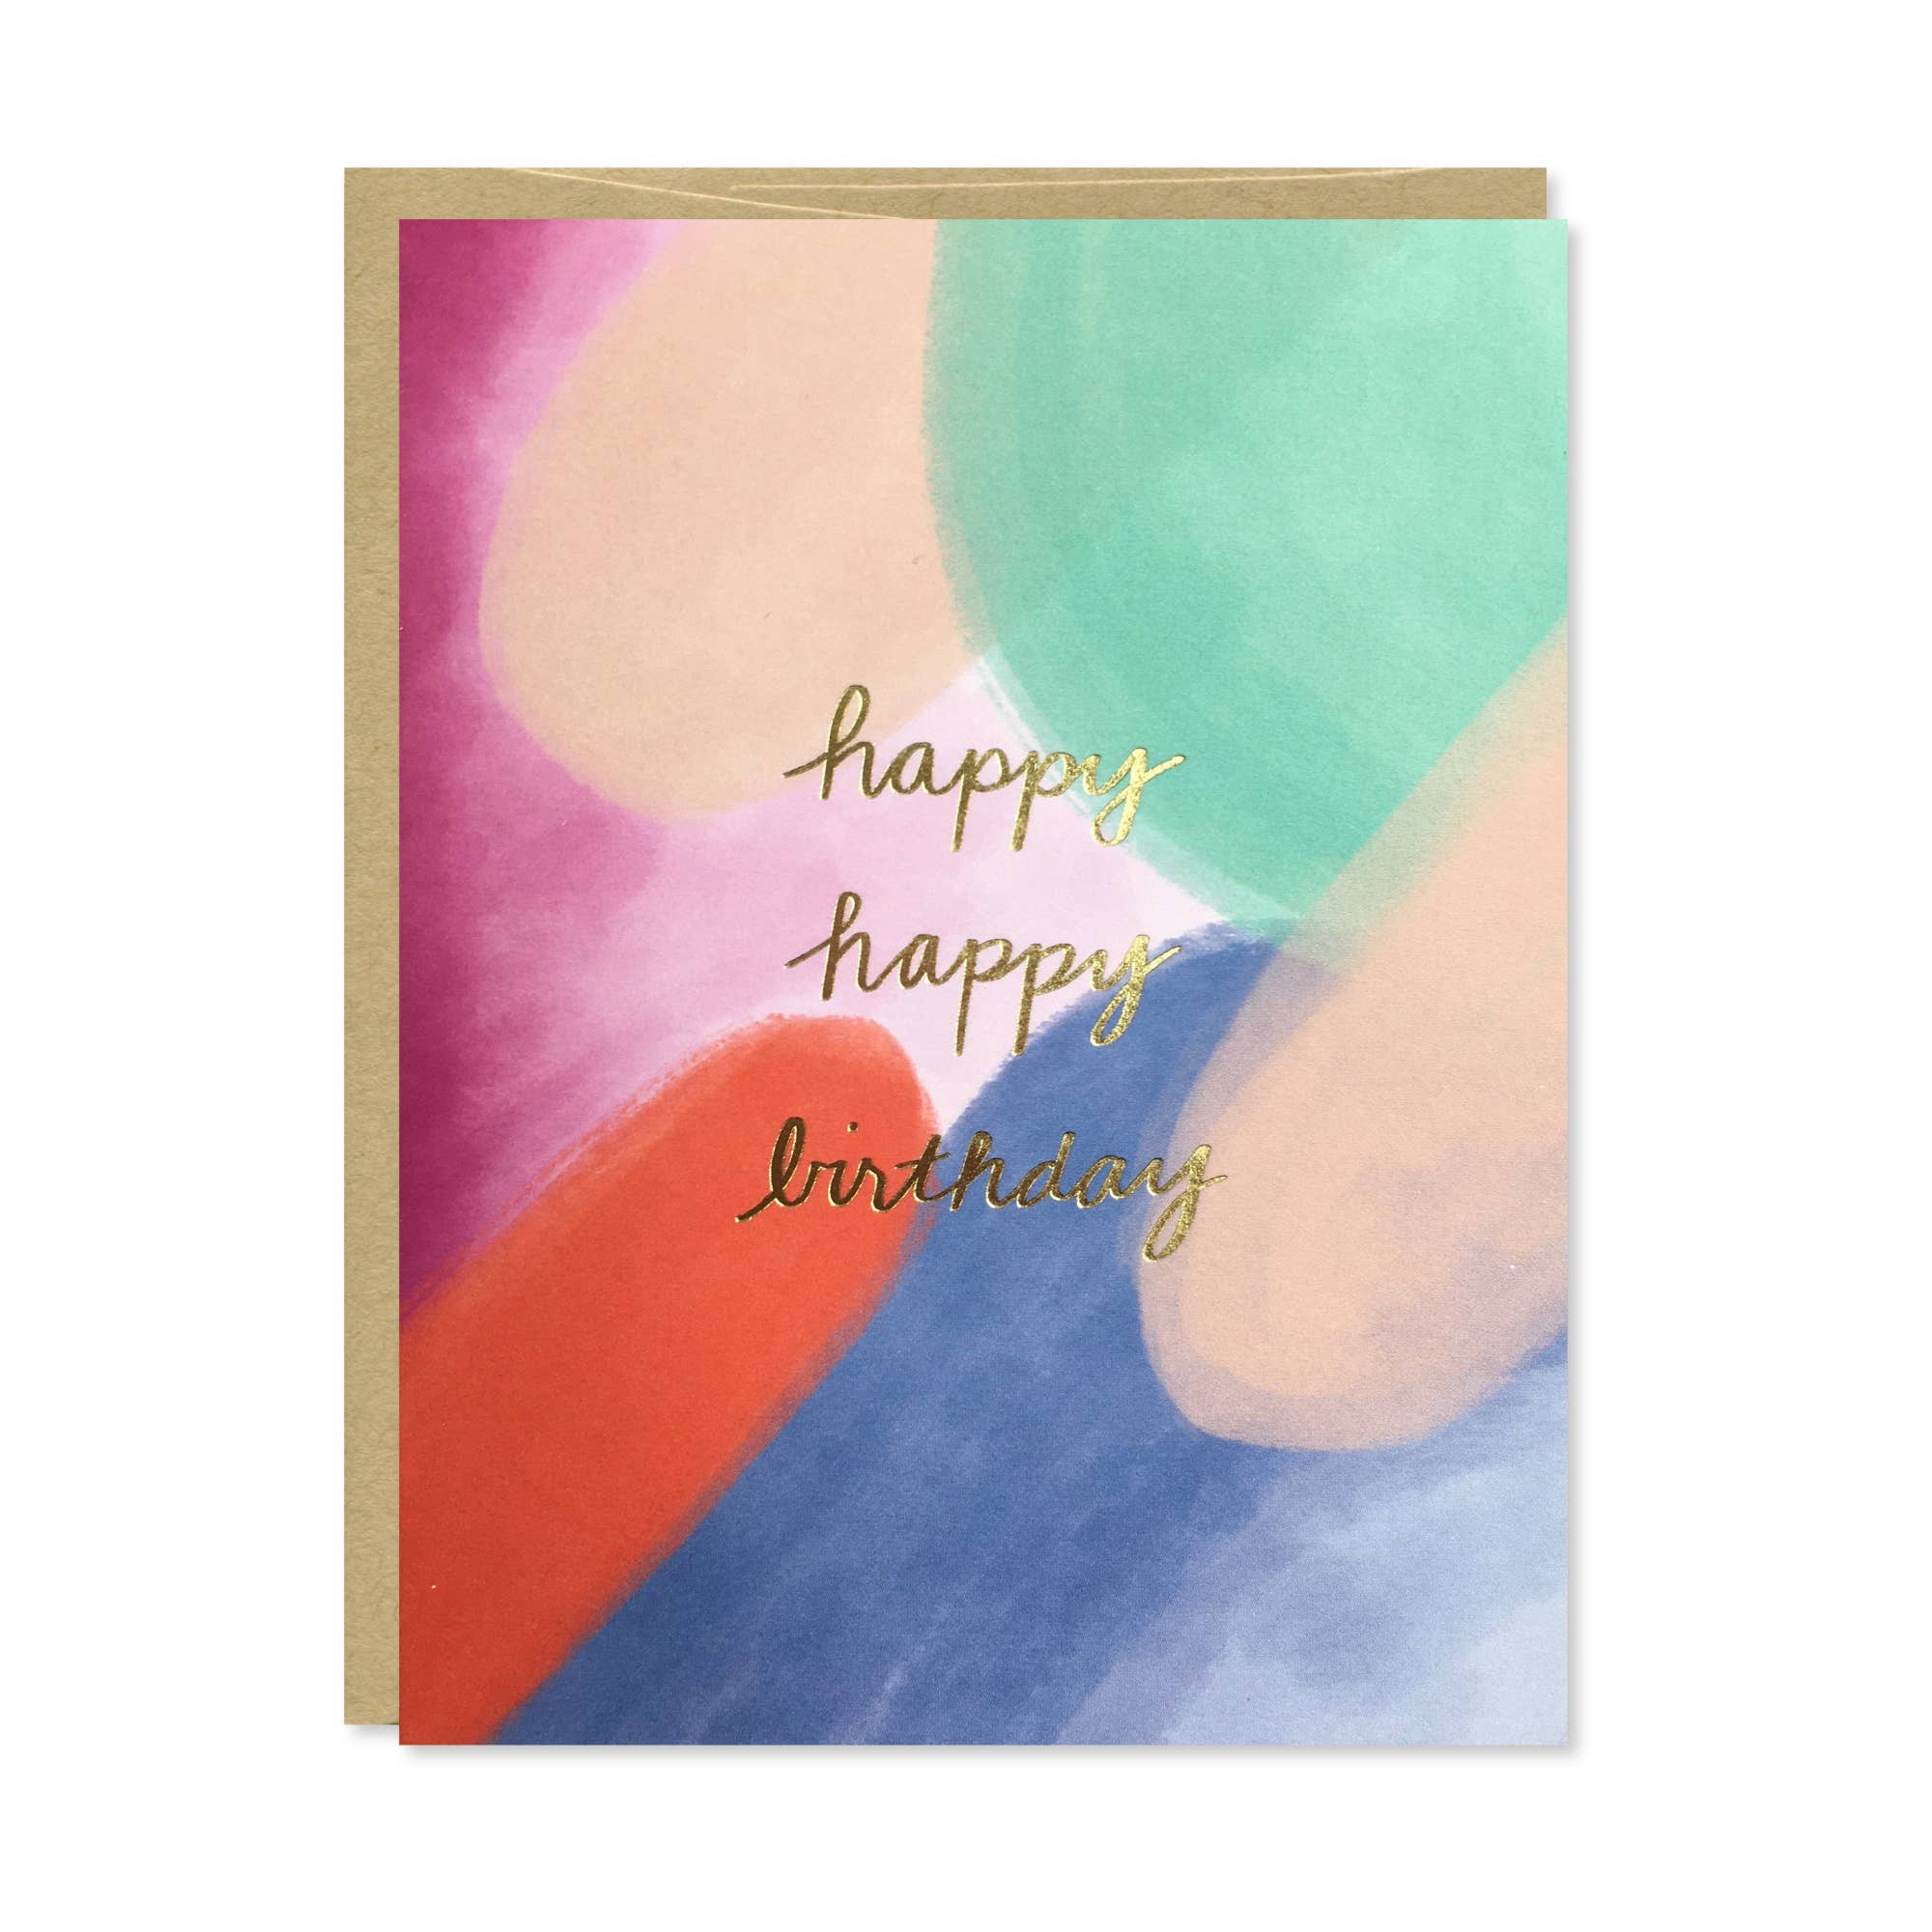 Happy Happy Birthday Gold Foil Card | Trada Marketplace